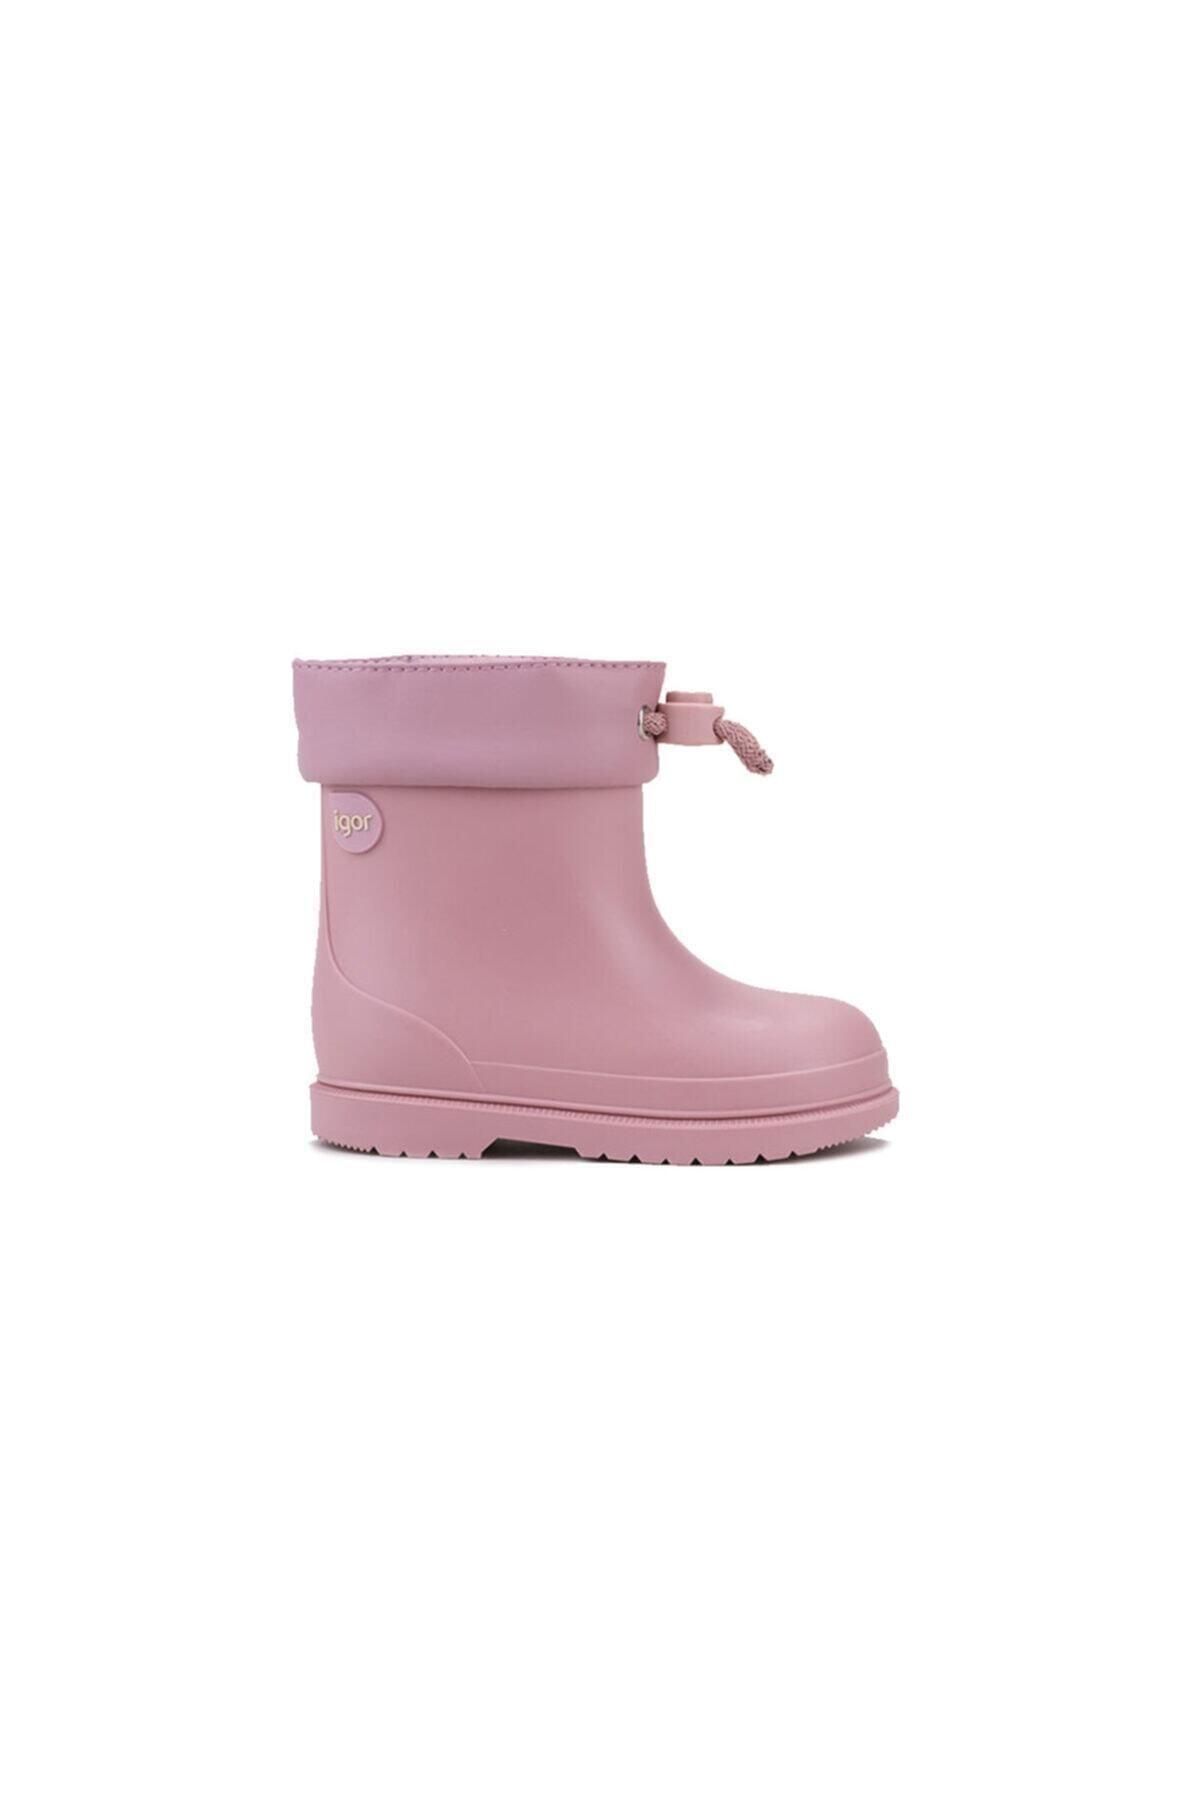 IGOR Kız Çocuk Pembe W10237-010 Bımbı Mc Rosa Pink Bot 1